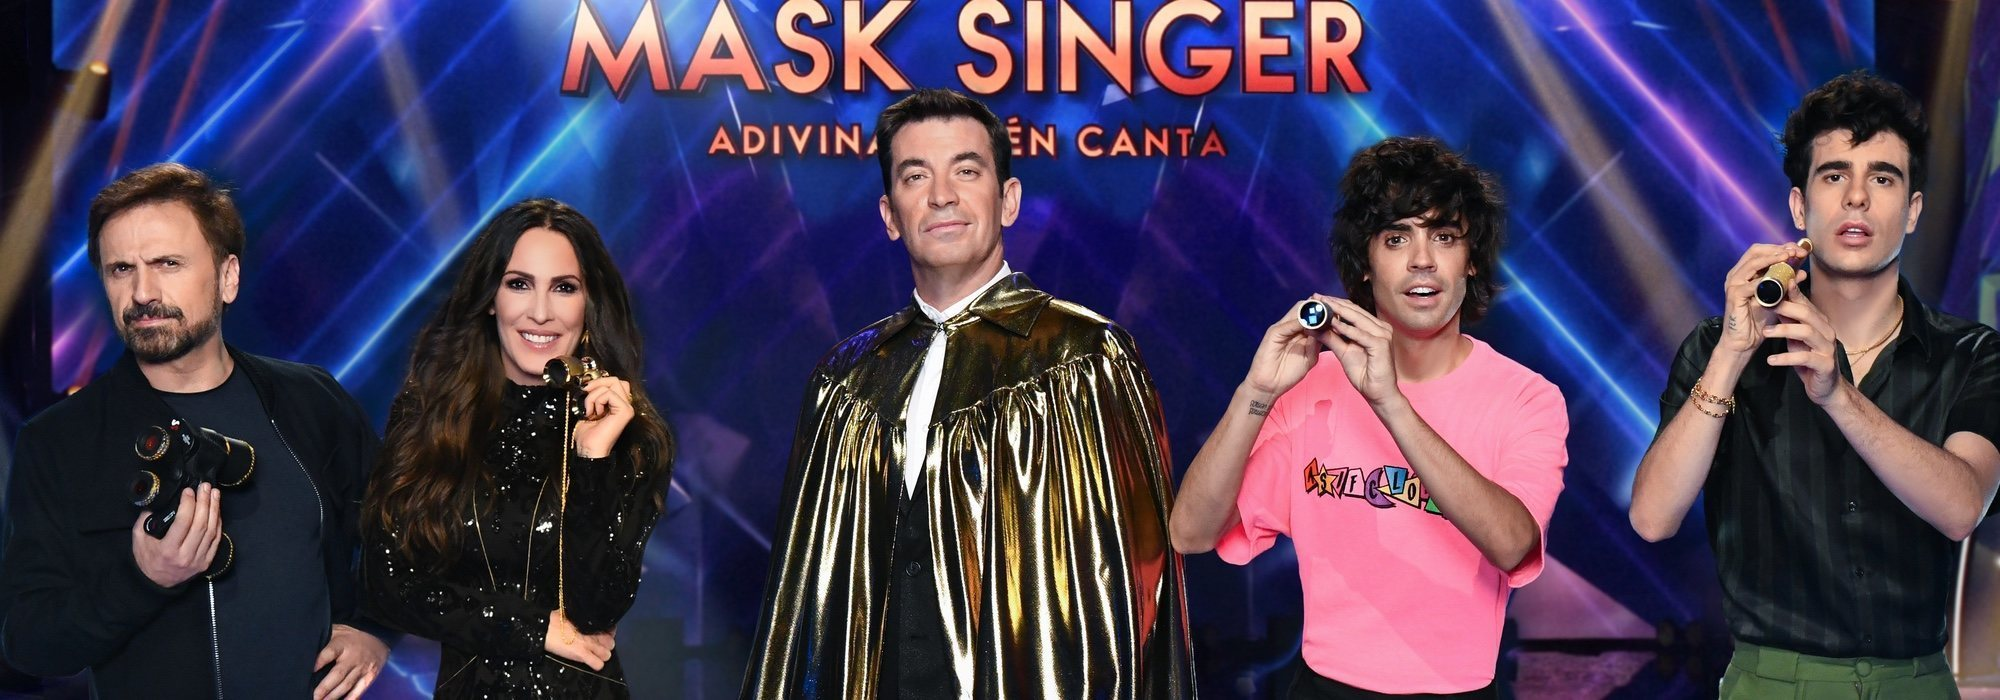 The Masked Singer España